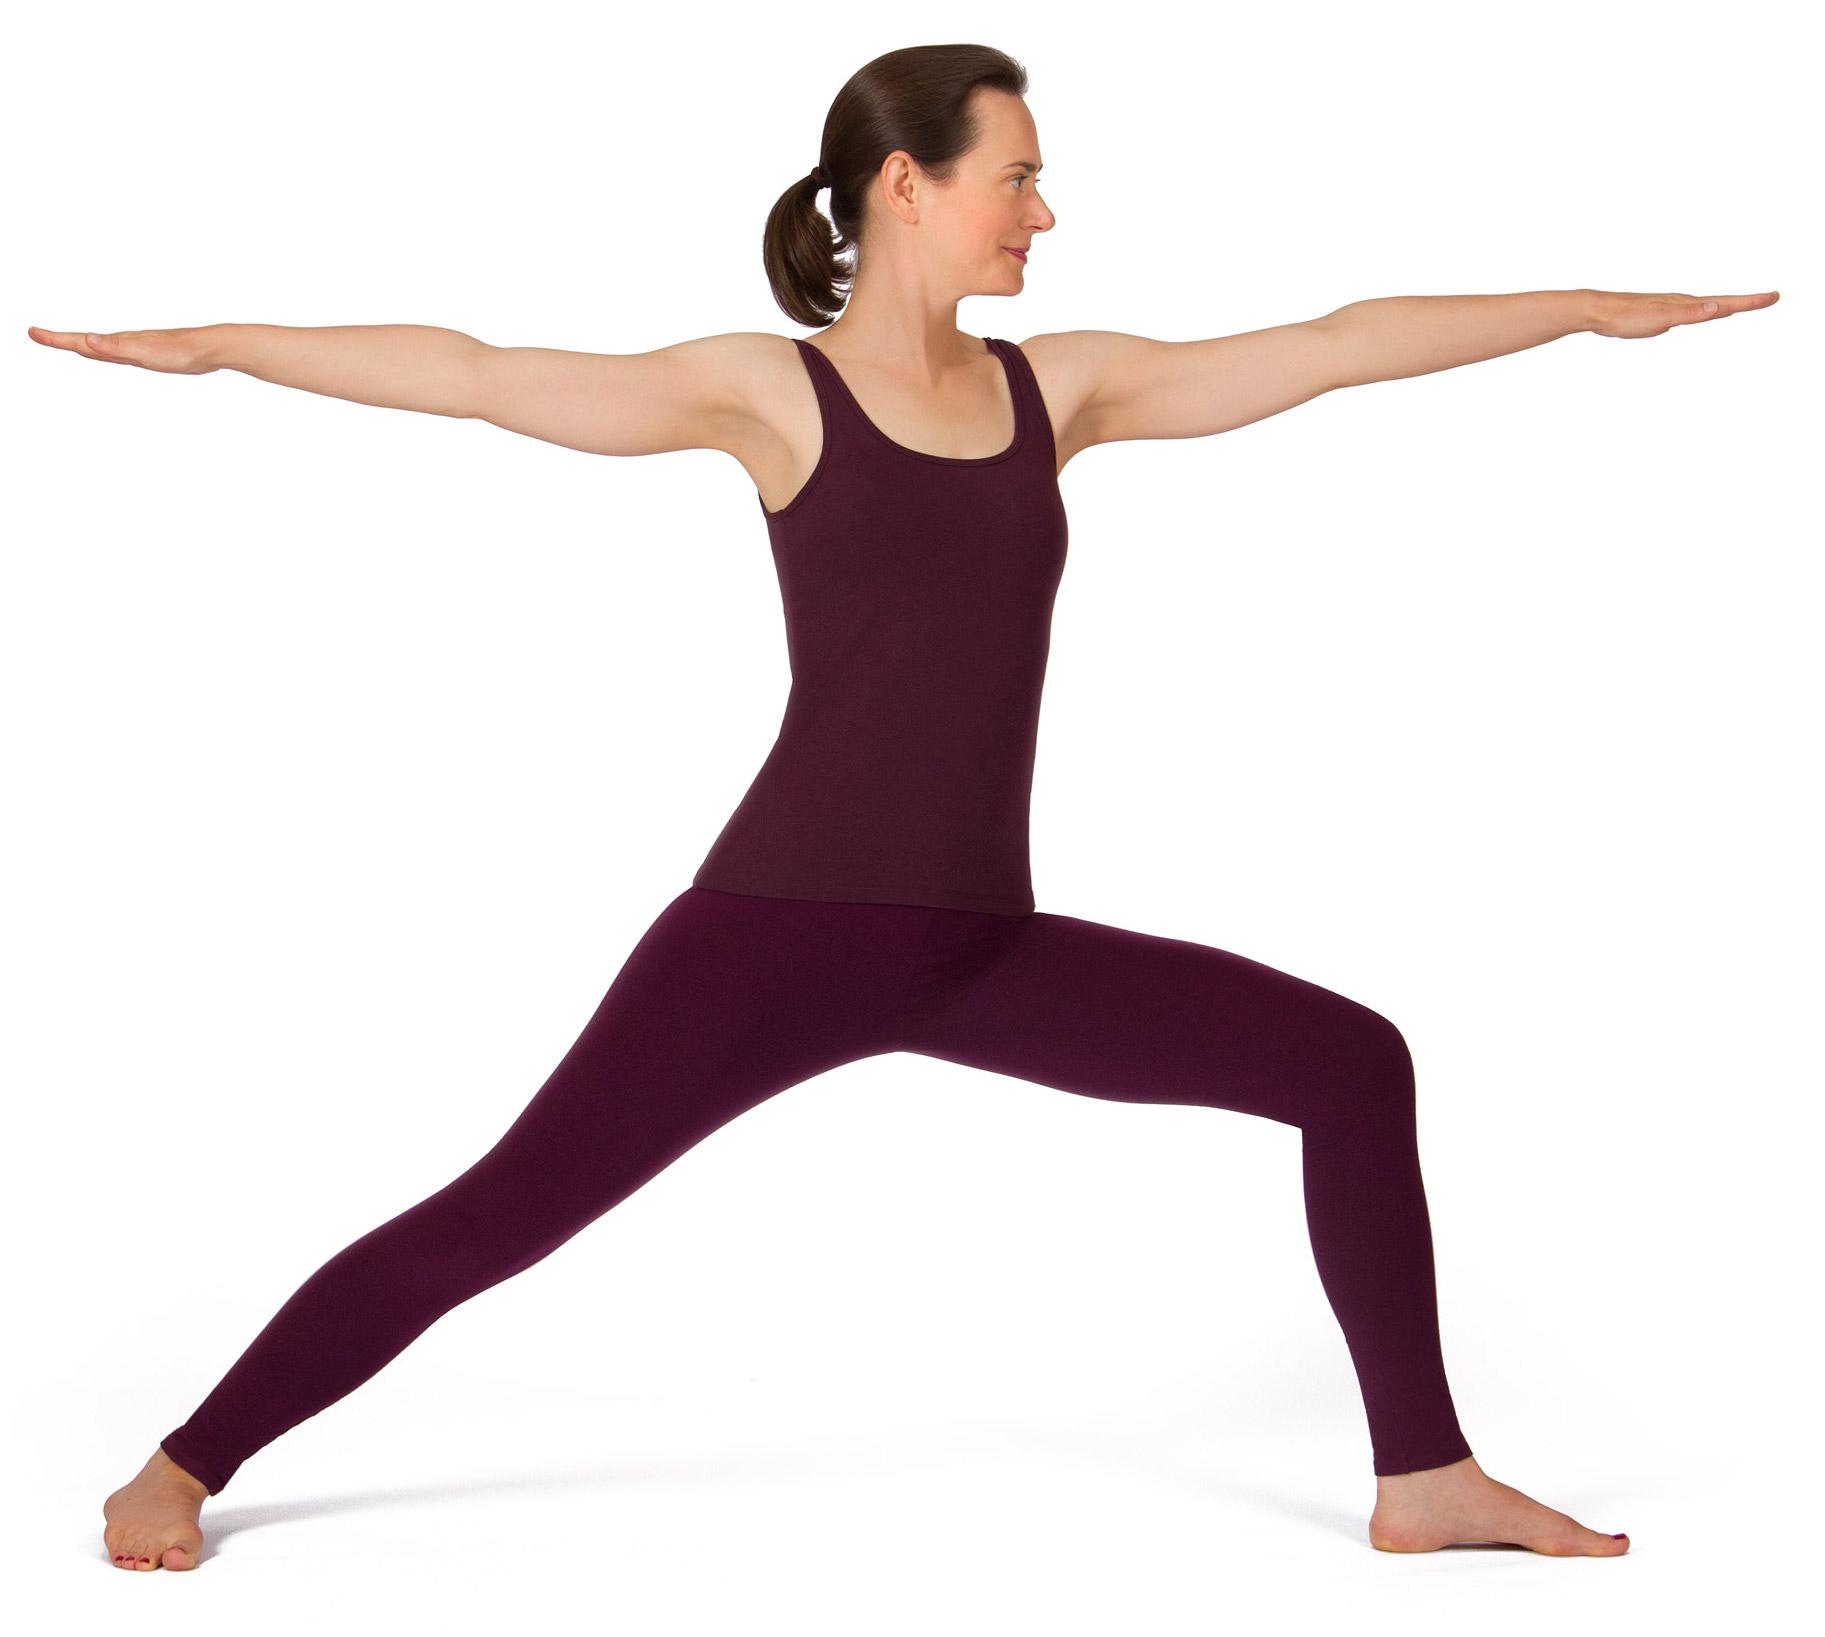 Die Geistige Symbolik Der Asanas Raja Yoga Auf Der Yogamatte Teil 1 Yoga Vidya Blog Yoga Meditation Und Ayurveda